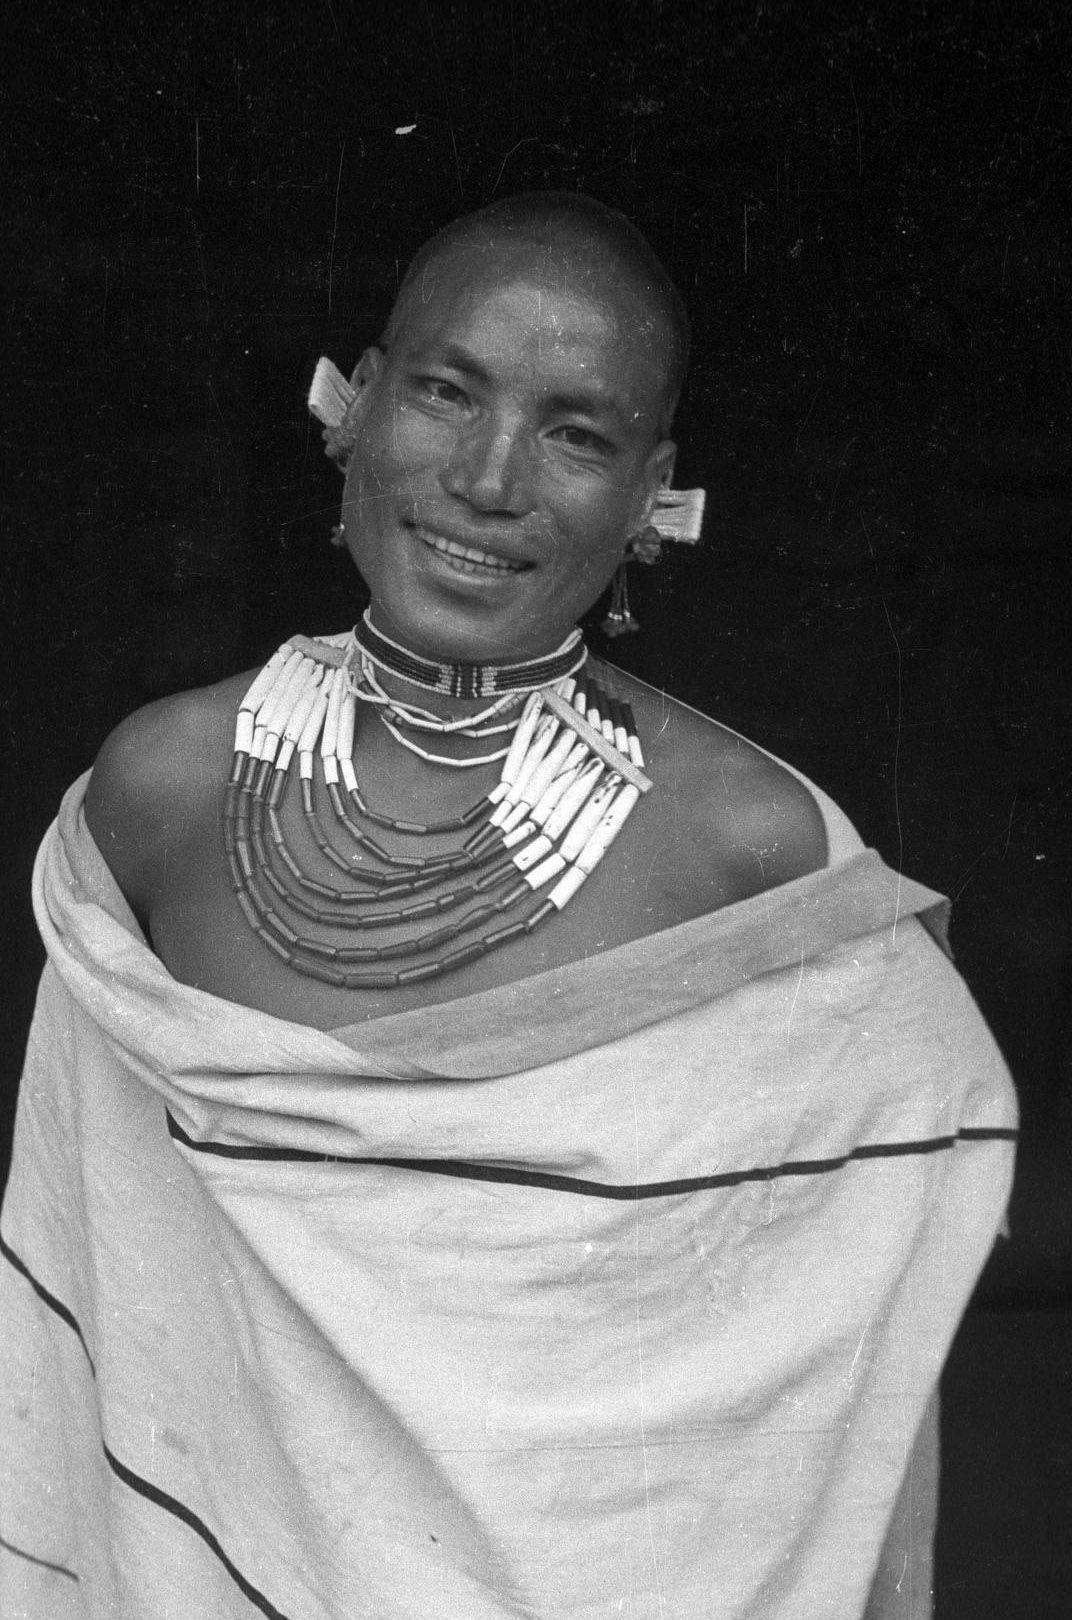 India | Eastern Angami Naga/Chakhesang Naga man. Terocheswemi (Terhutsesemi), Nagaland, Phek District. 1936. | ©SOAS, Nicholas Haimendorf